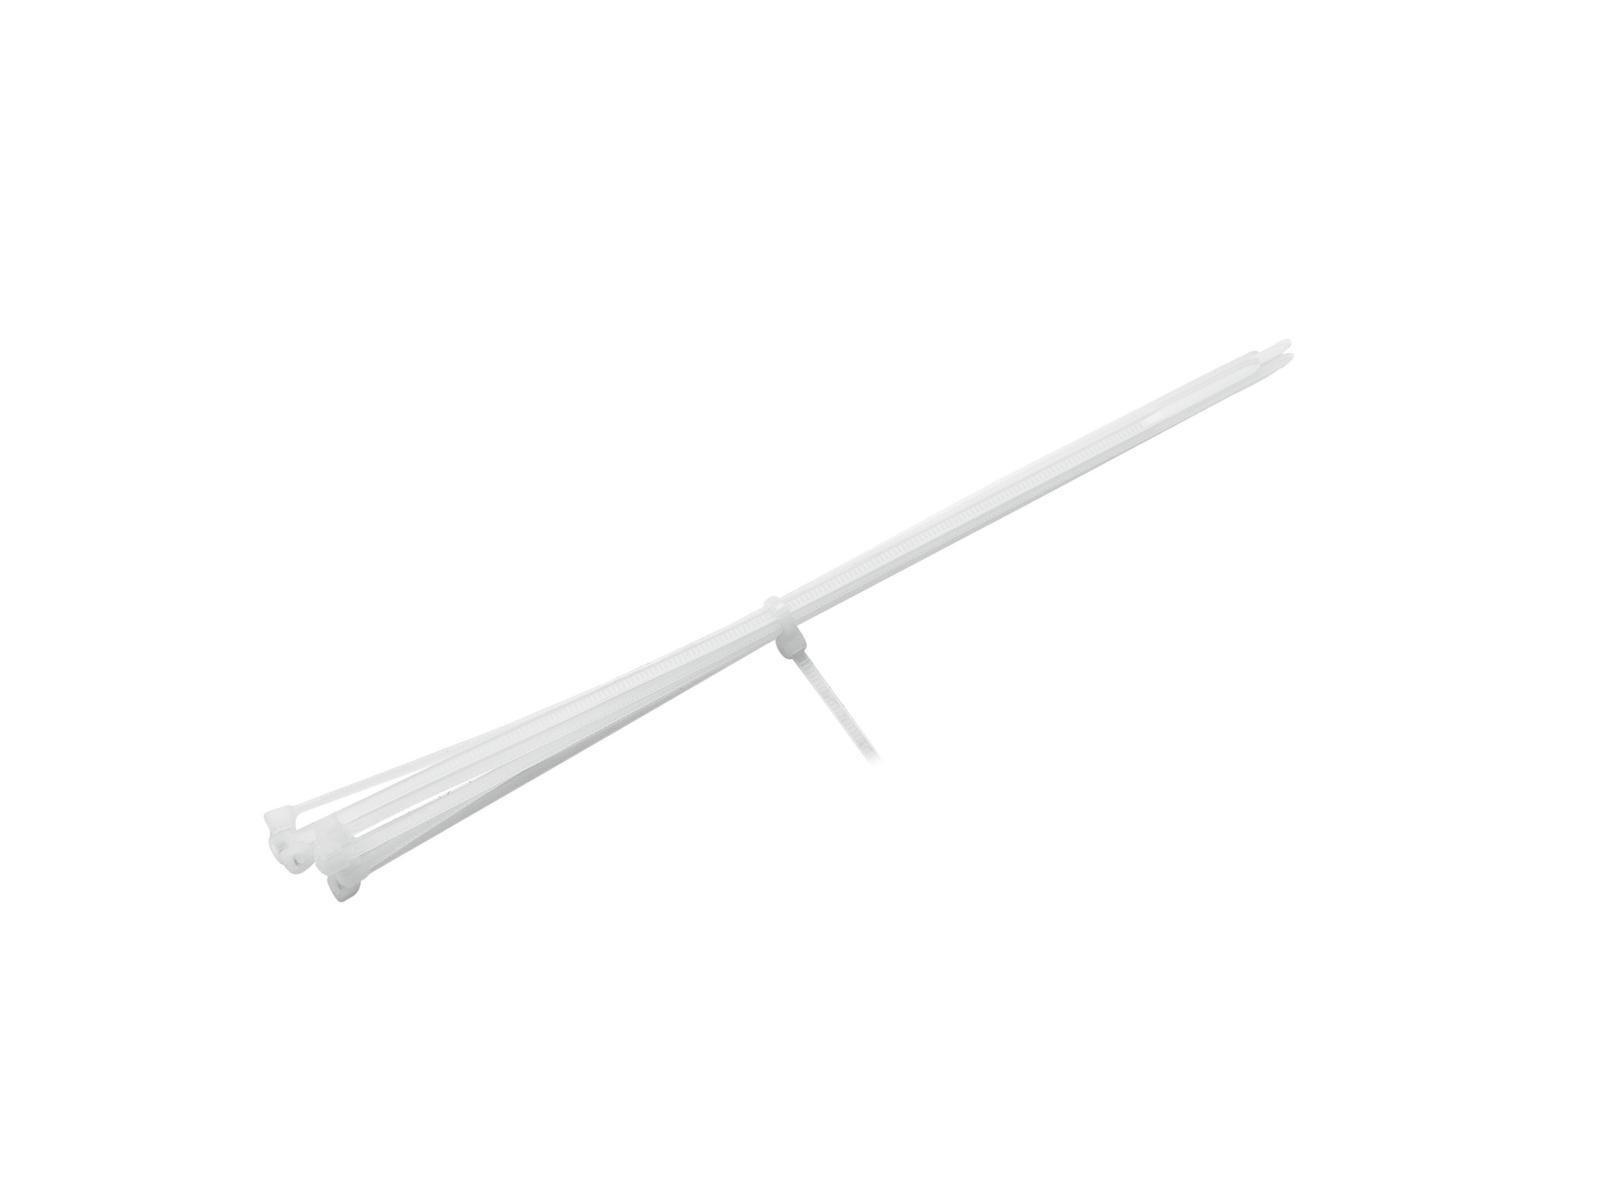 EUROLITE Cavo cravatta 200x2.2mm bianco 100x